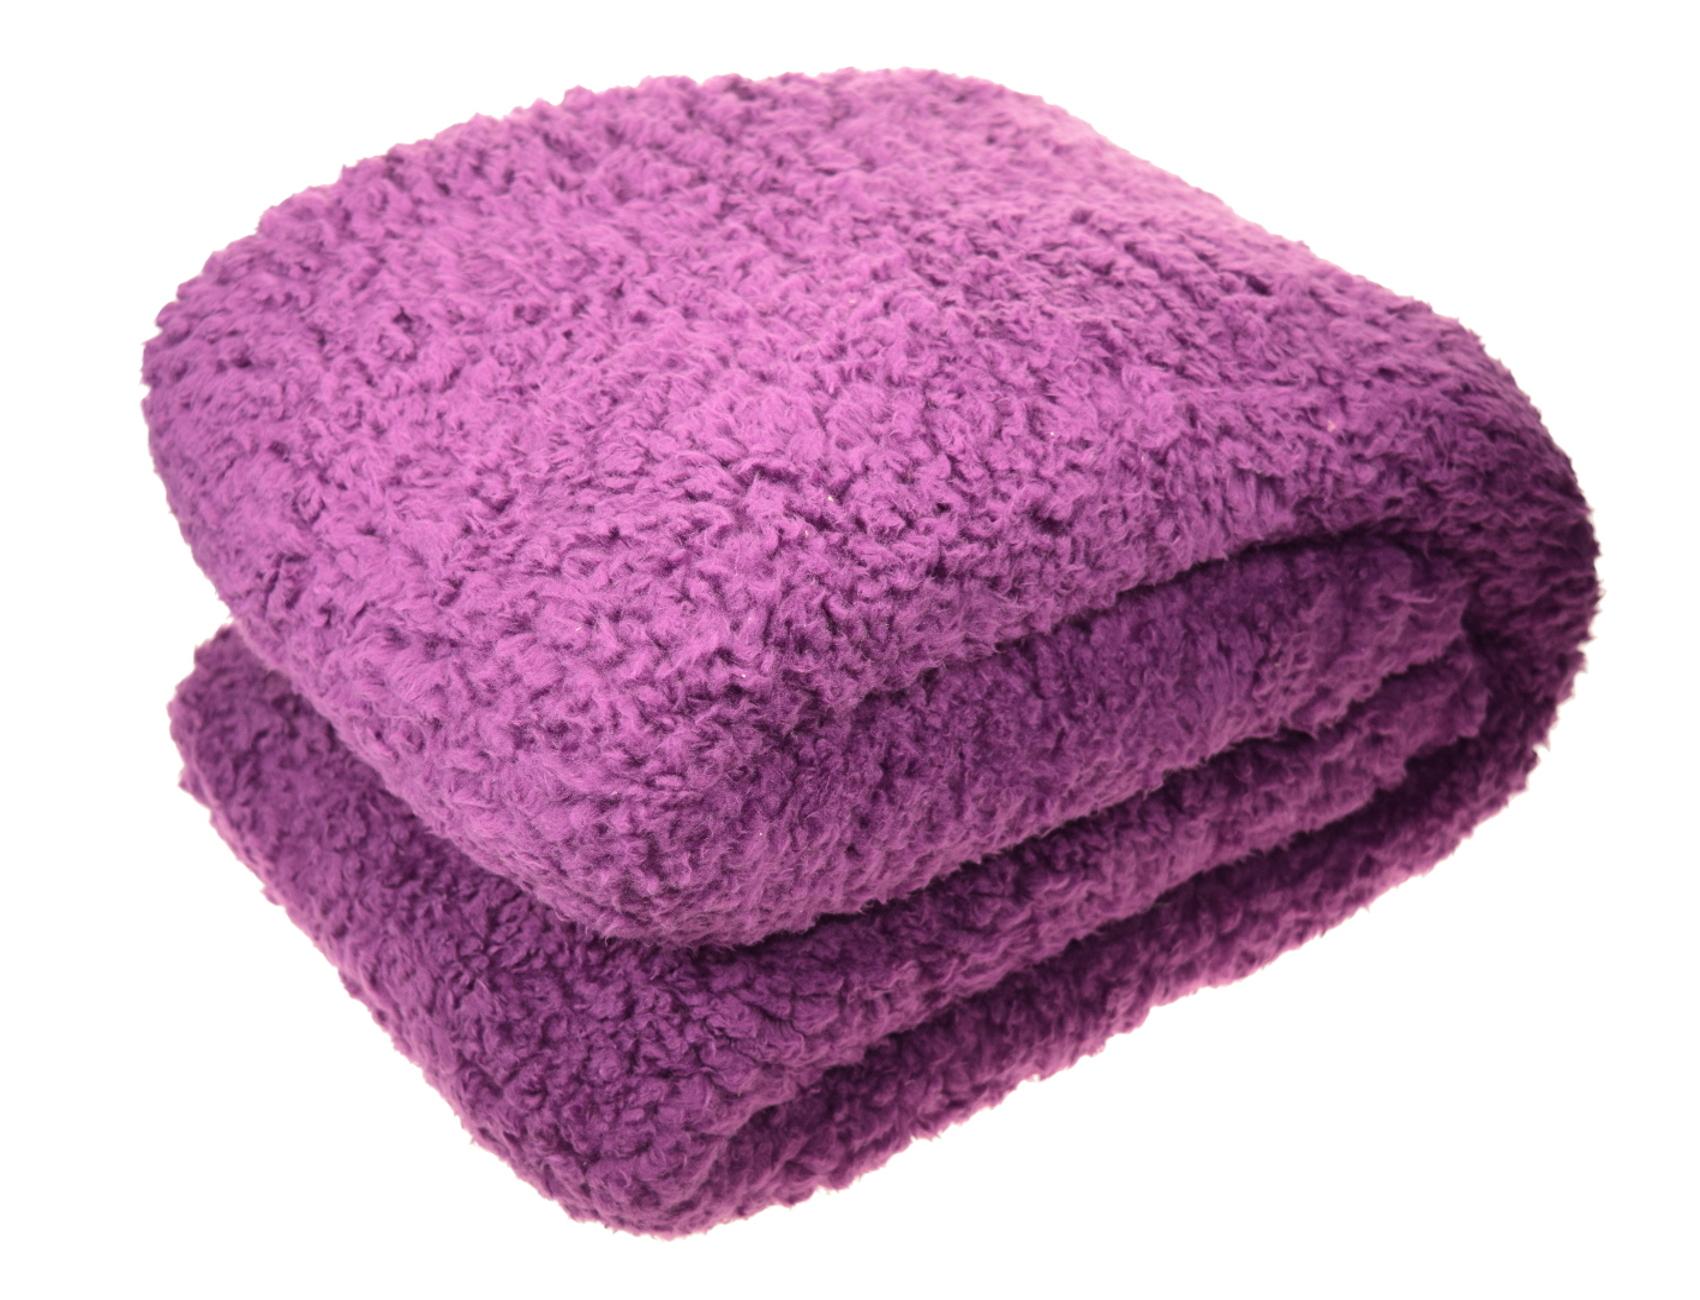 Teddy Fleece Blanket Super Soft Bed Sofa Home Thick Fleecy Throw